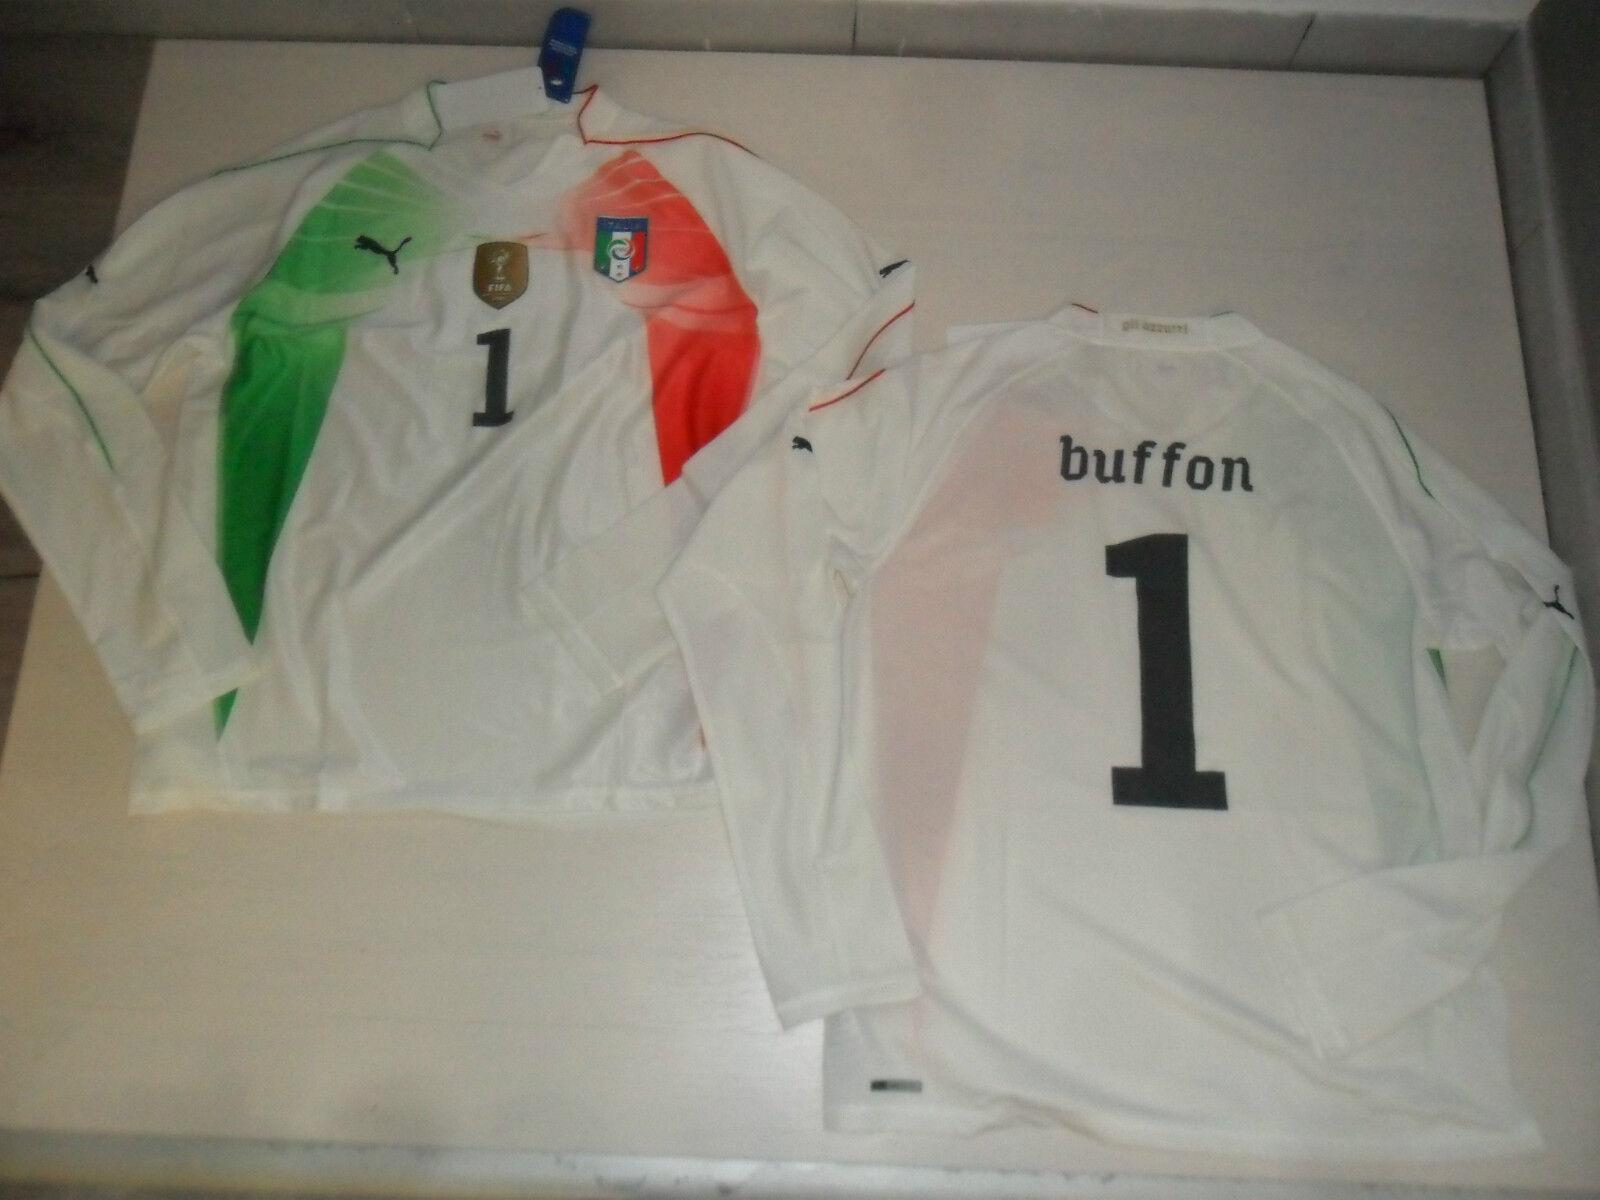 2573 PUMA ITALIA AUTHENTIC SHIRT JERSEY MANGA LARGA BUFFON CAMISETA PORTERO